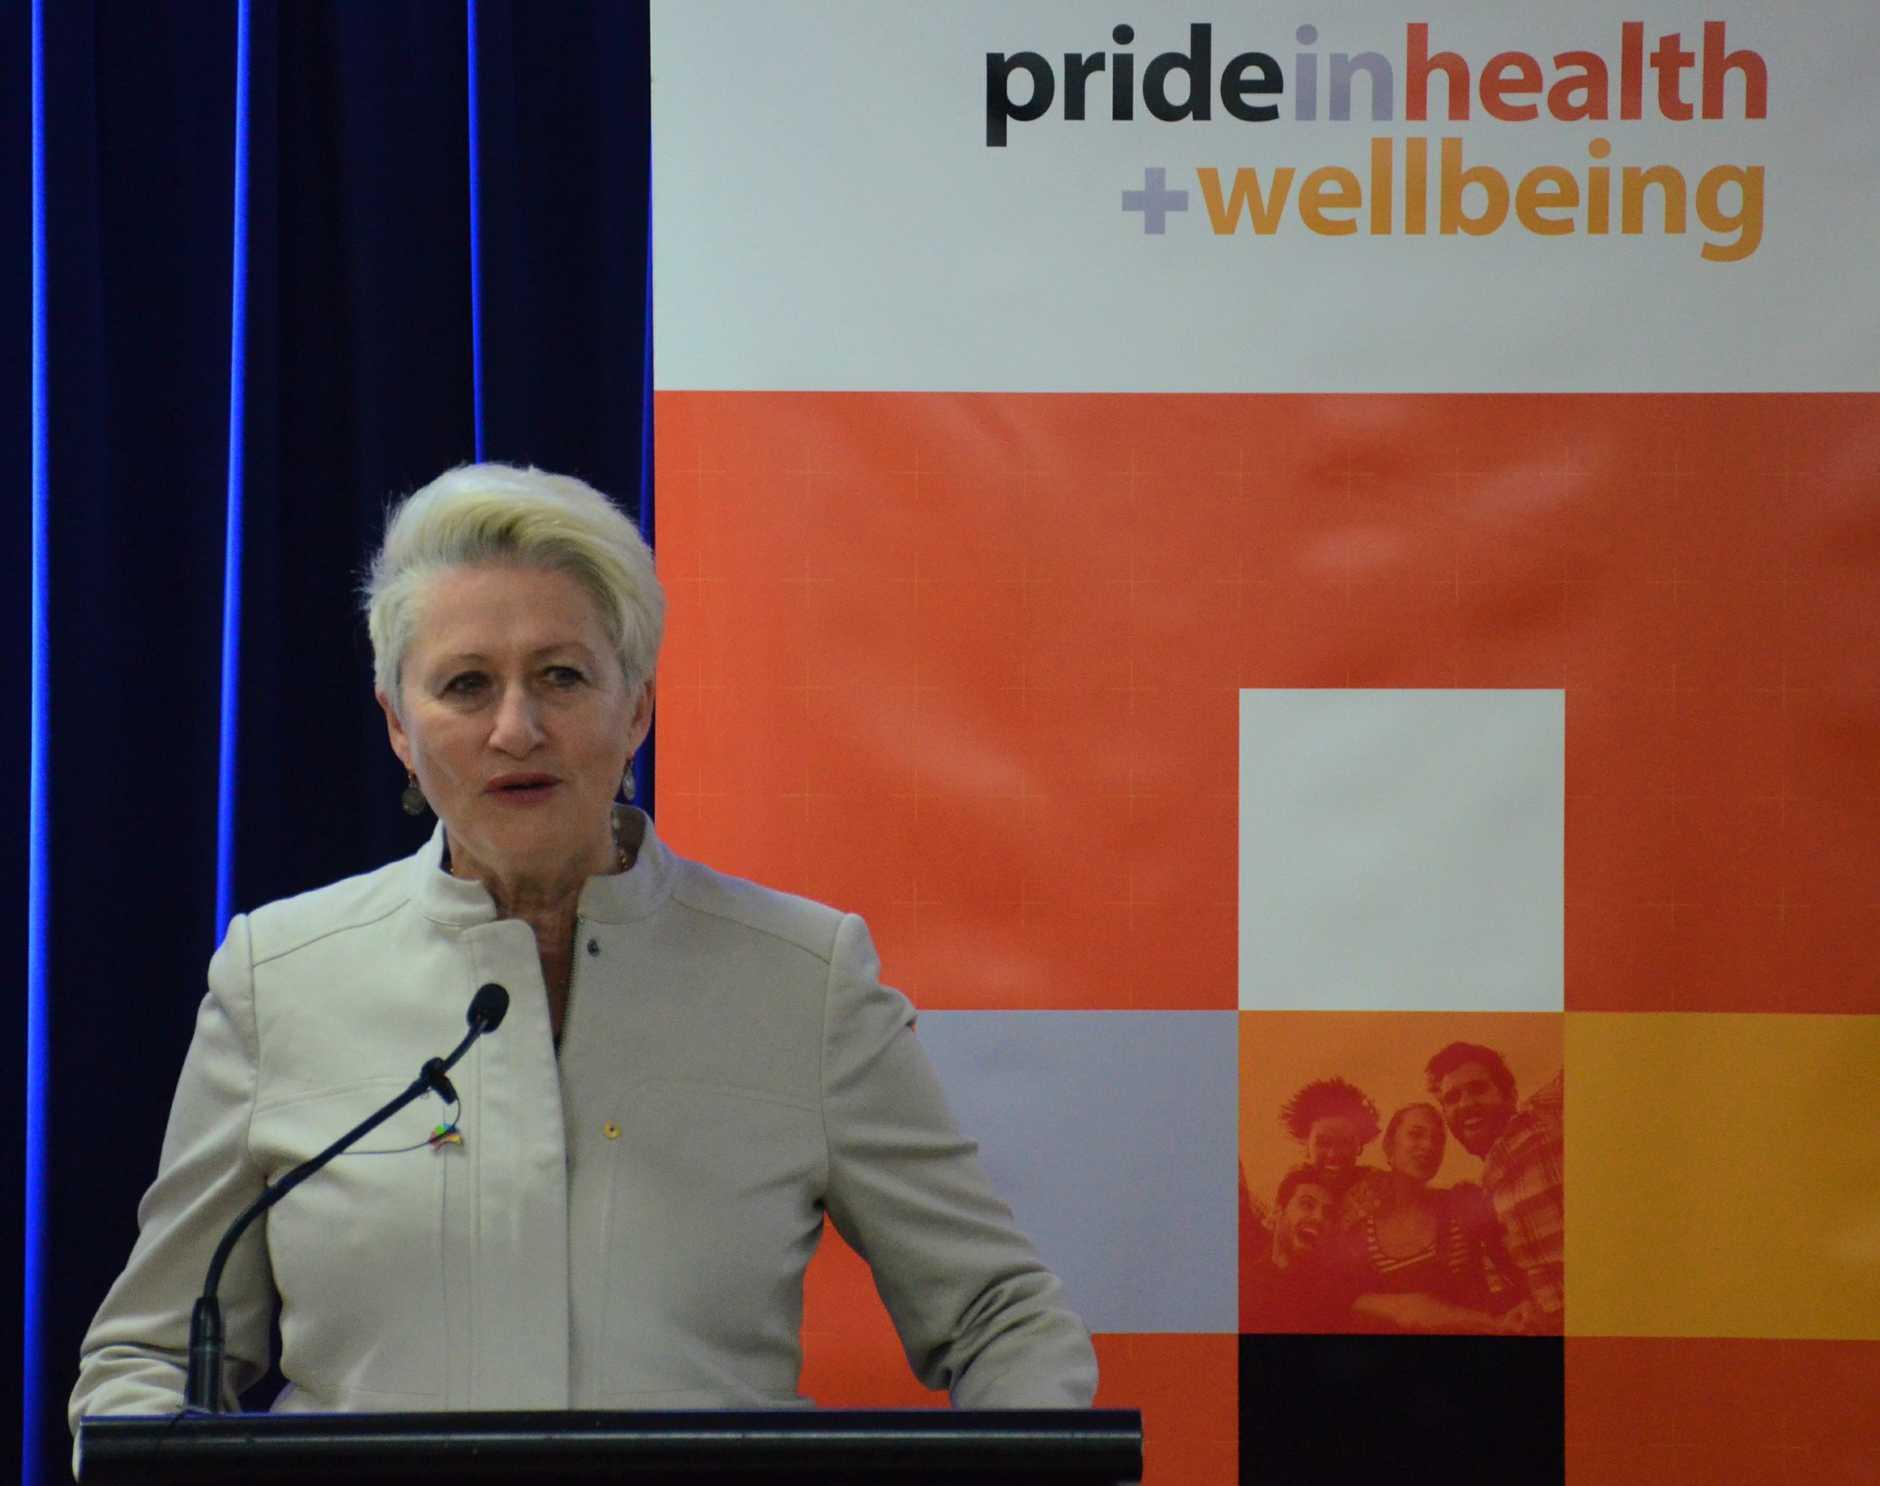 PRIDE HEALTH: LGBTI health advocate Prof Kerryn Phelps speaking at the Pride in Health + Wellbeing program launch.